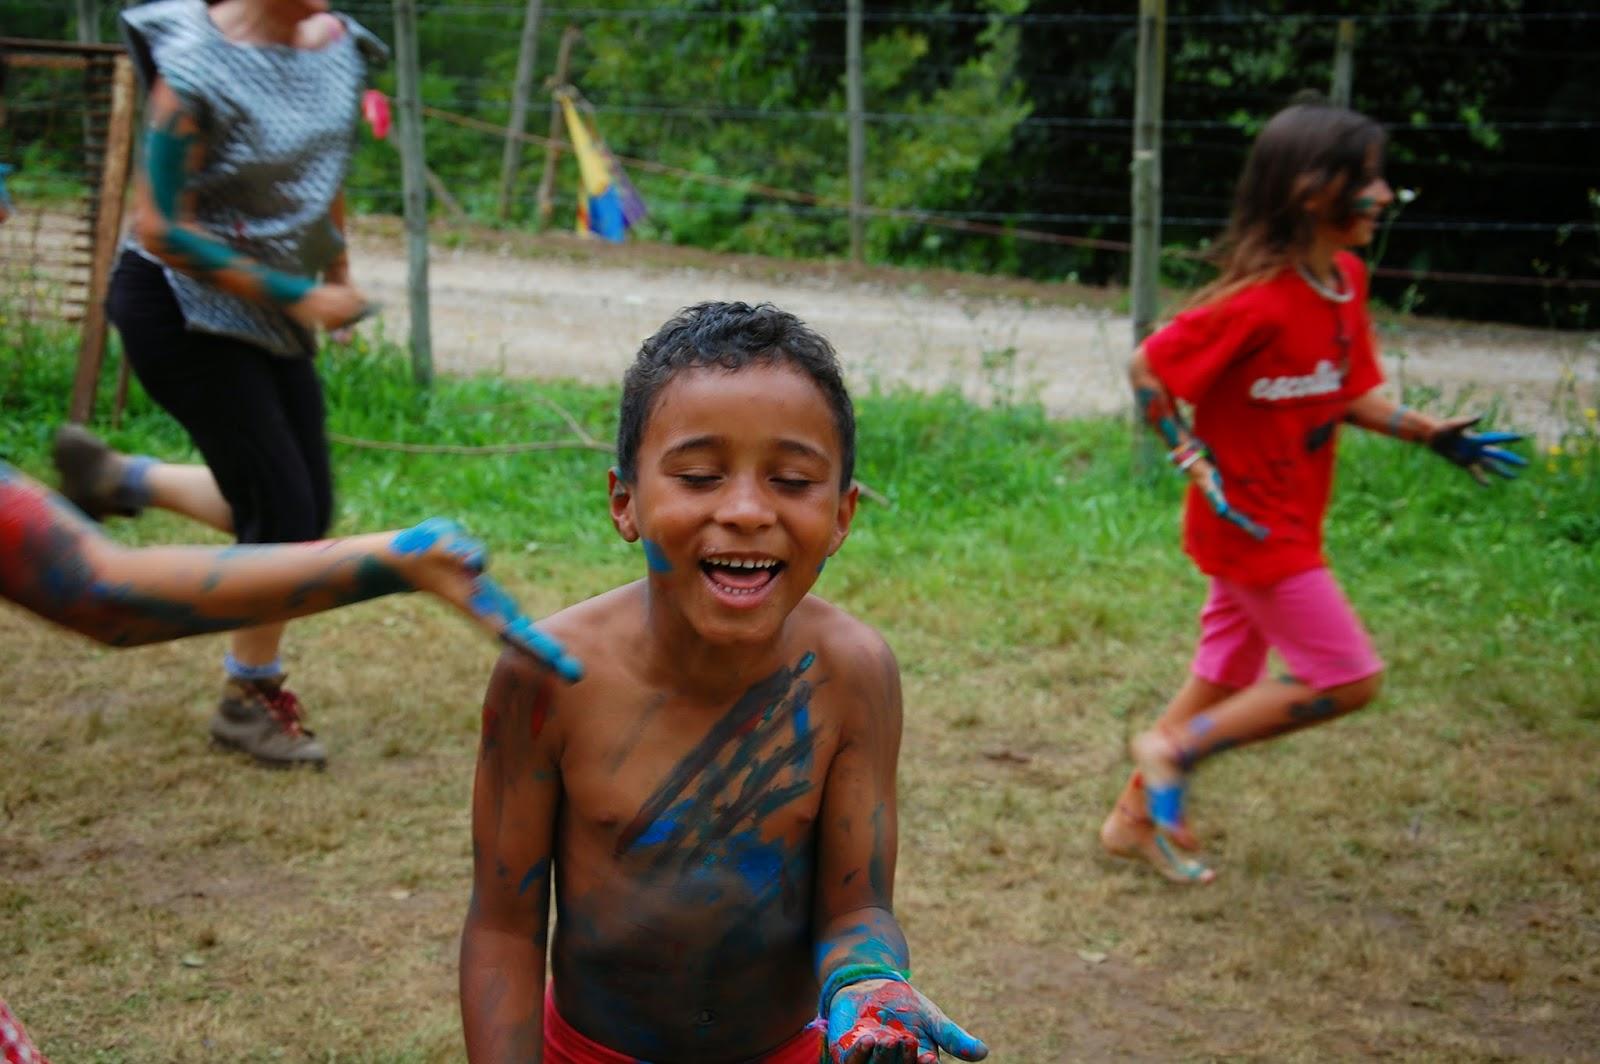 Campaments Estiu RolandKing 2011 - DSC_0360.JPG